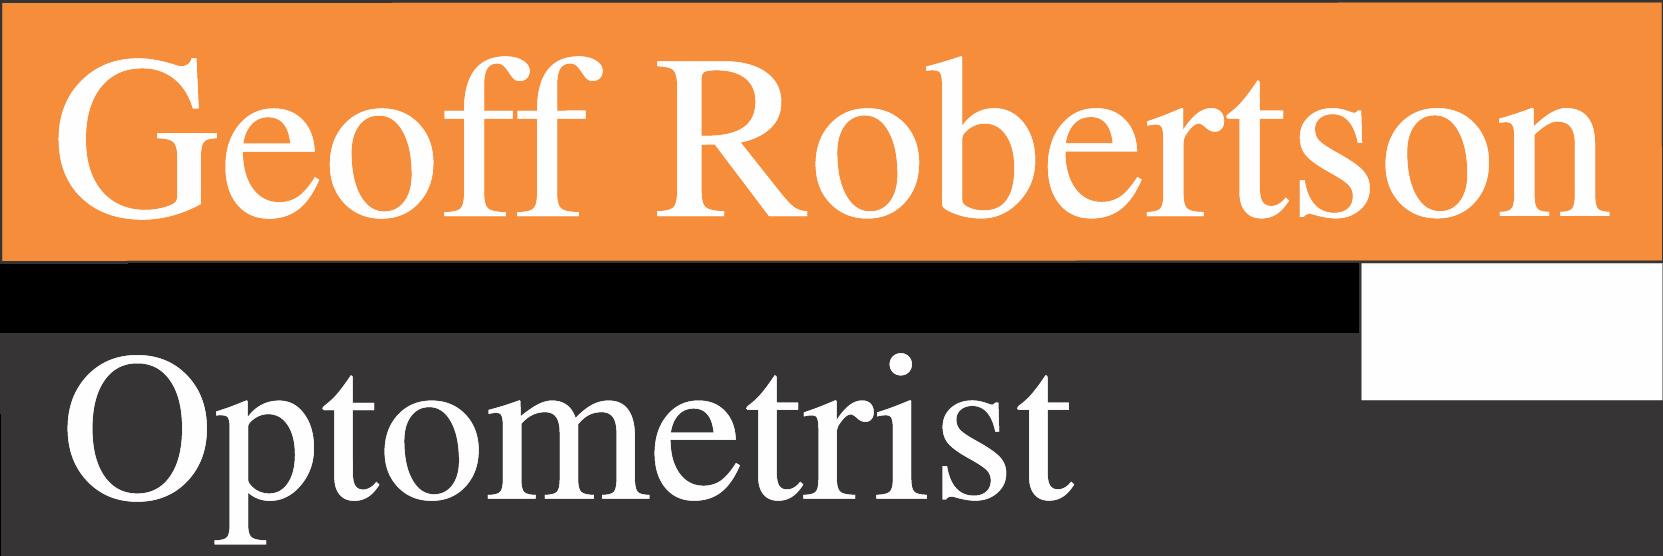 Geoff Robertson Optometrist